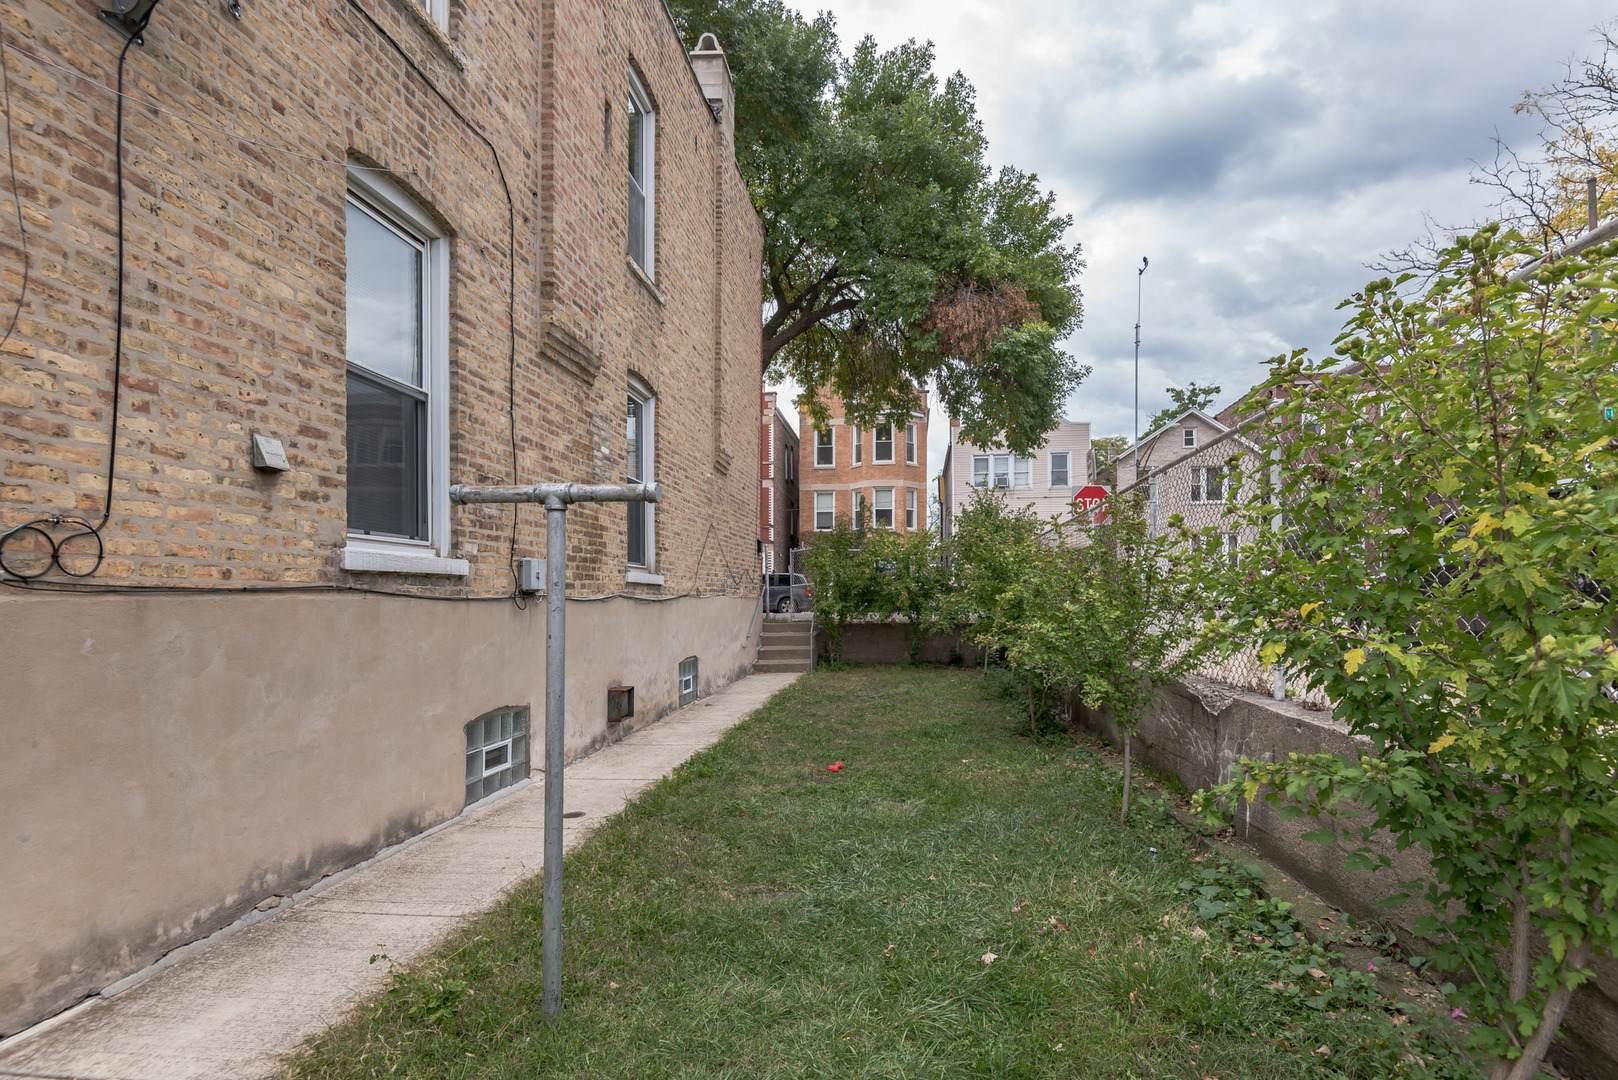 3220 S Lituanica Avenue, Chicago, IL 60608 (MLS #10853731) :: Littlefield Group